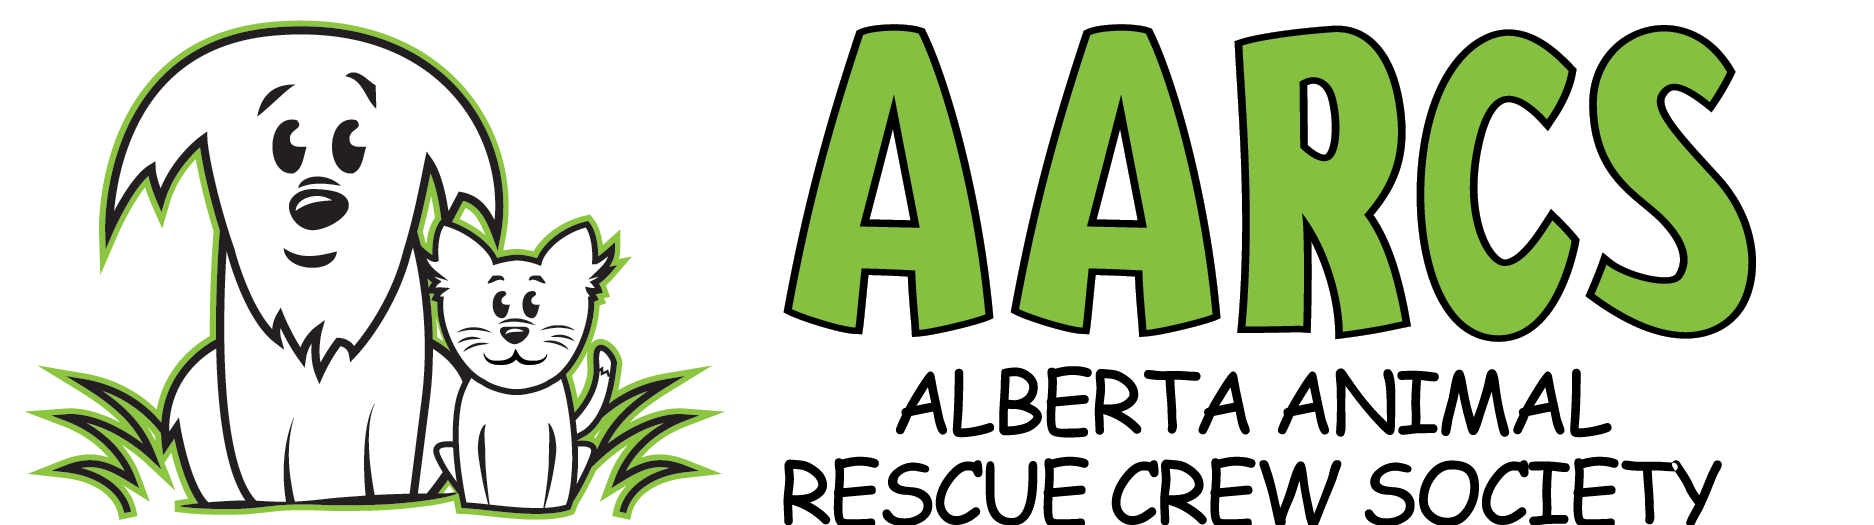 aarcs logo